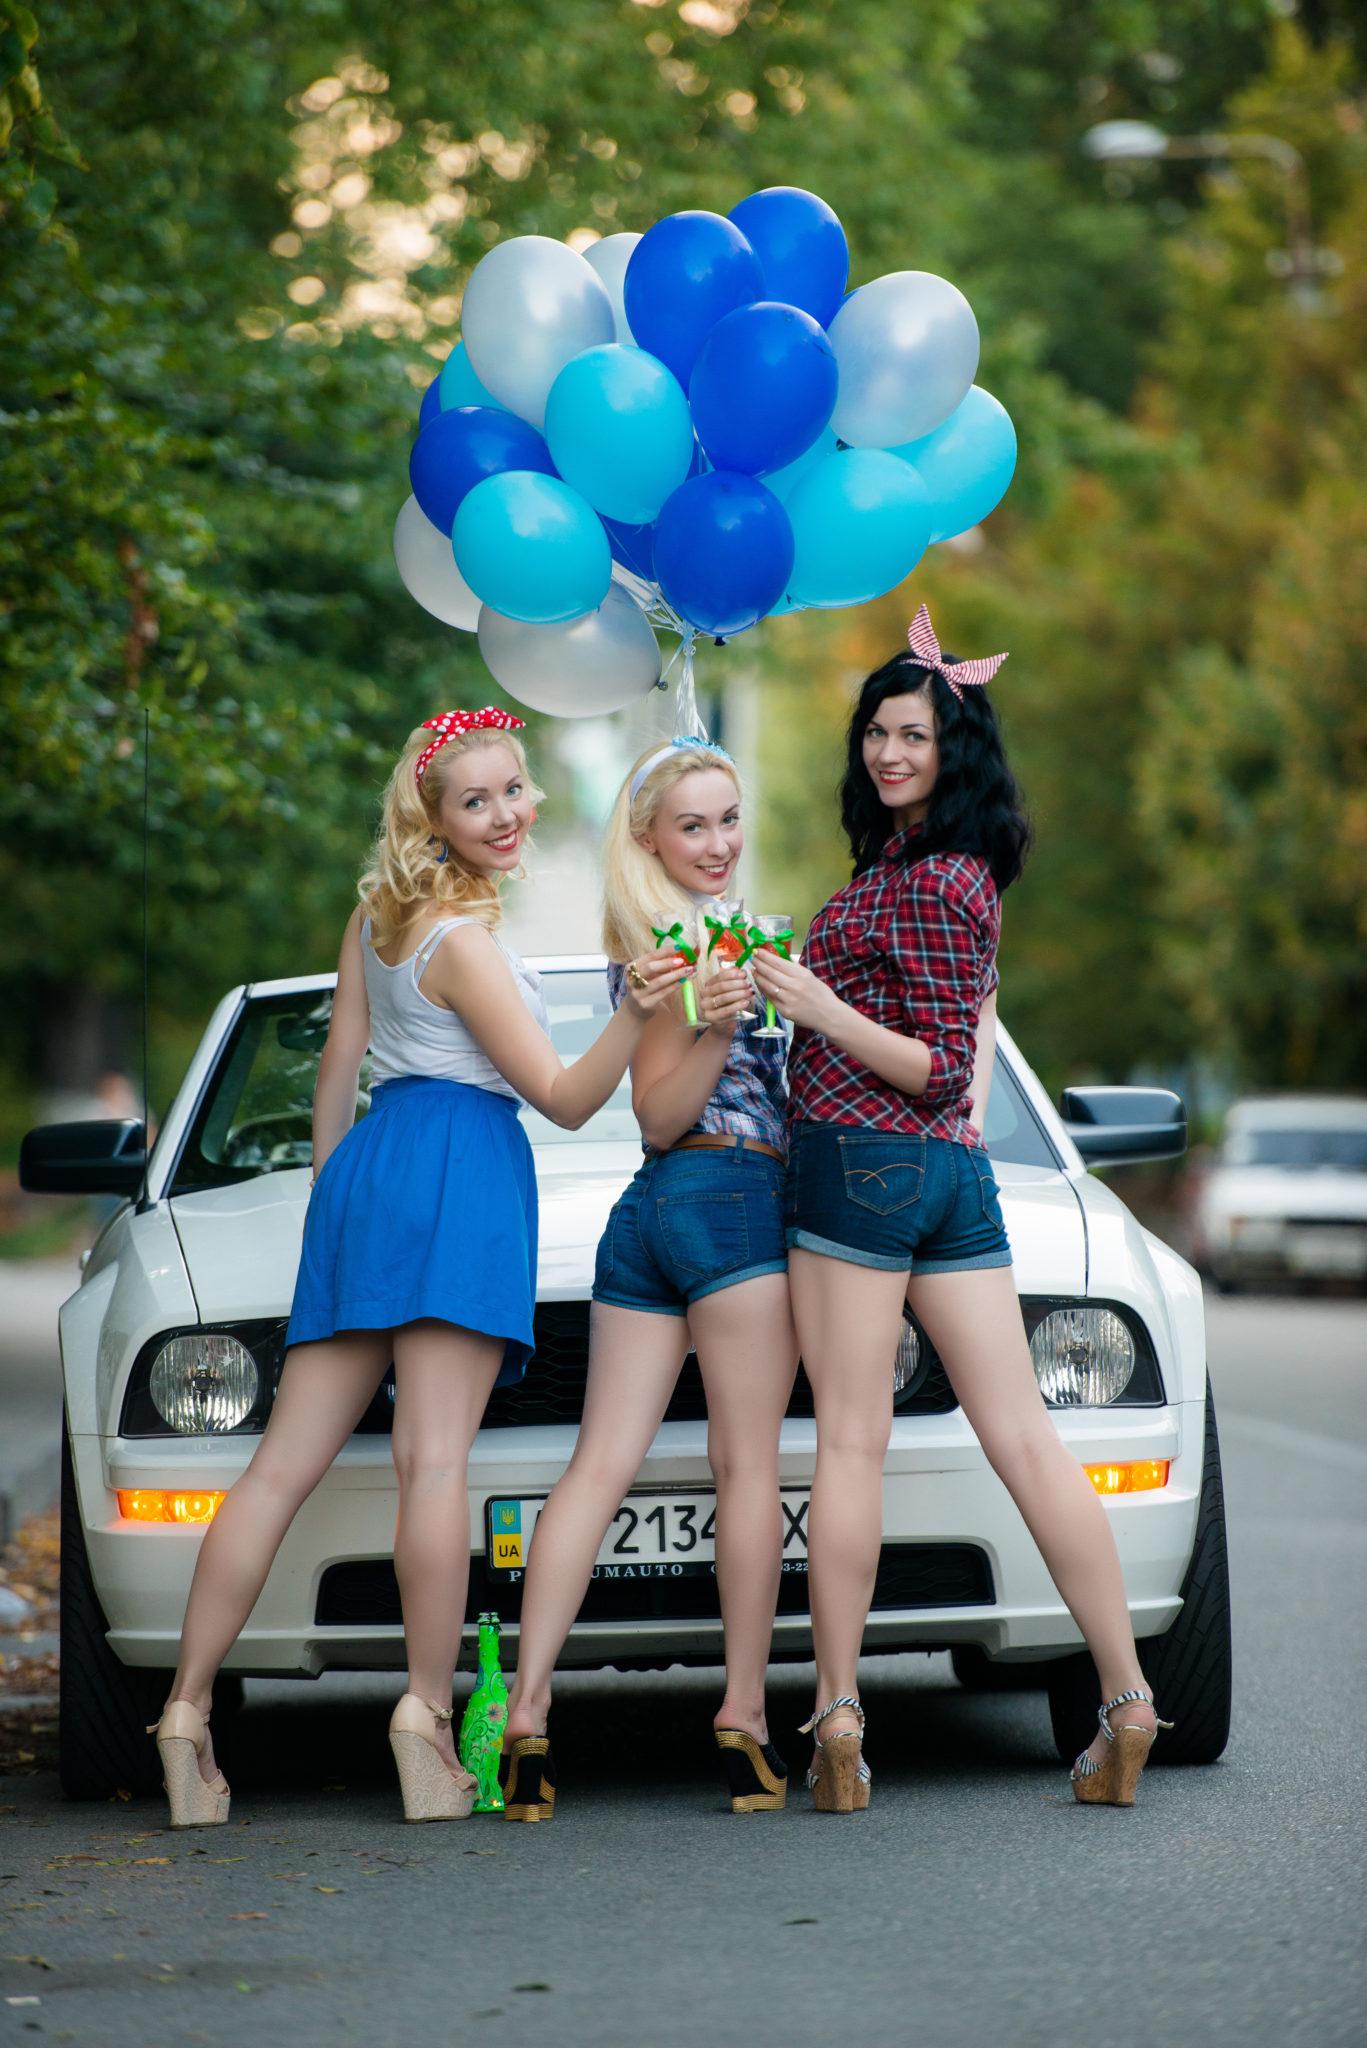 Девичник на природе, 3 девушки с шариками